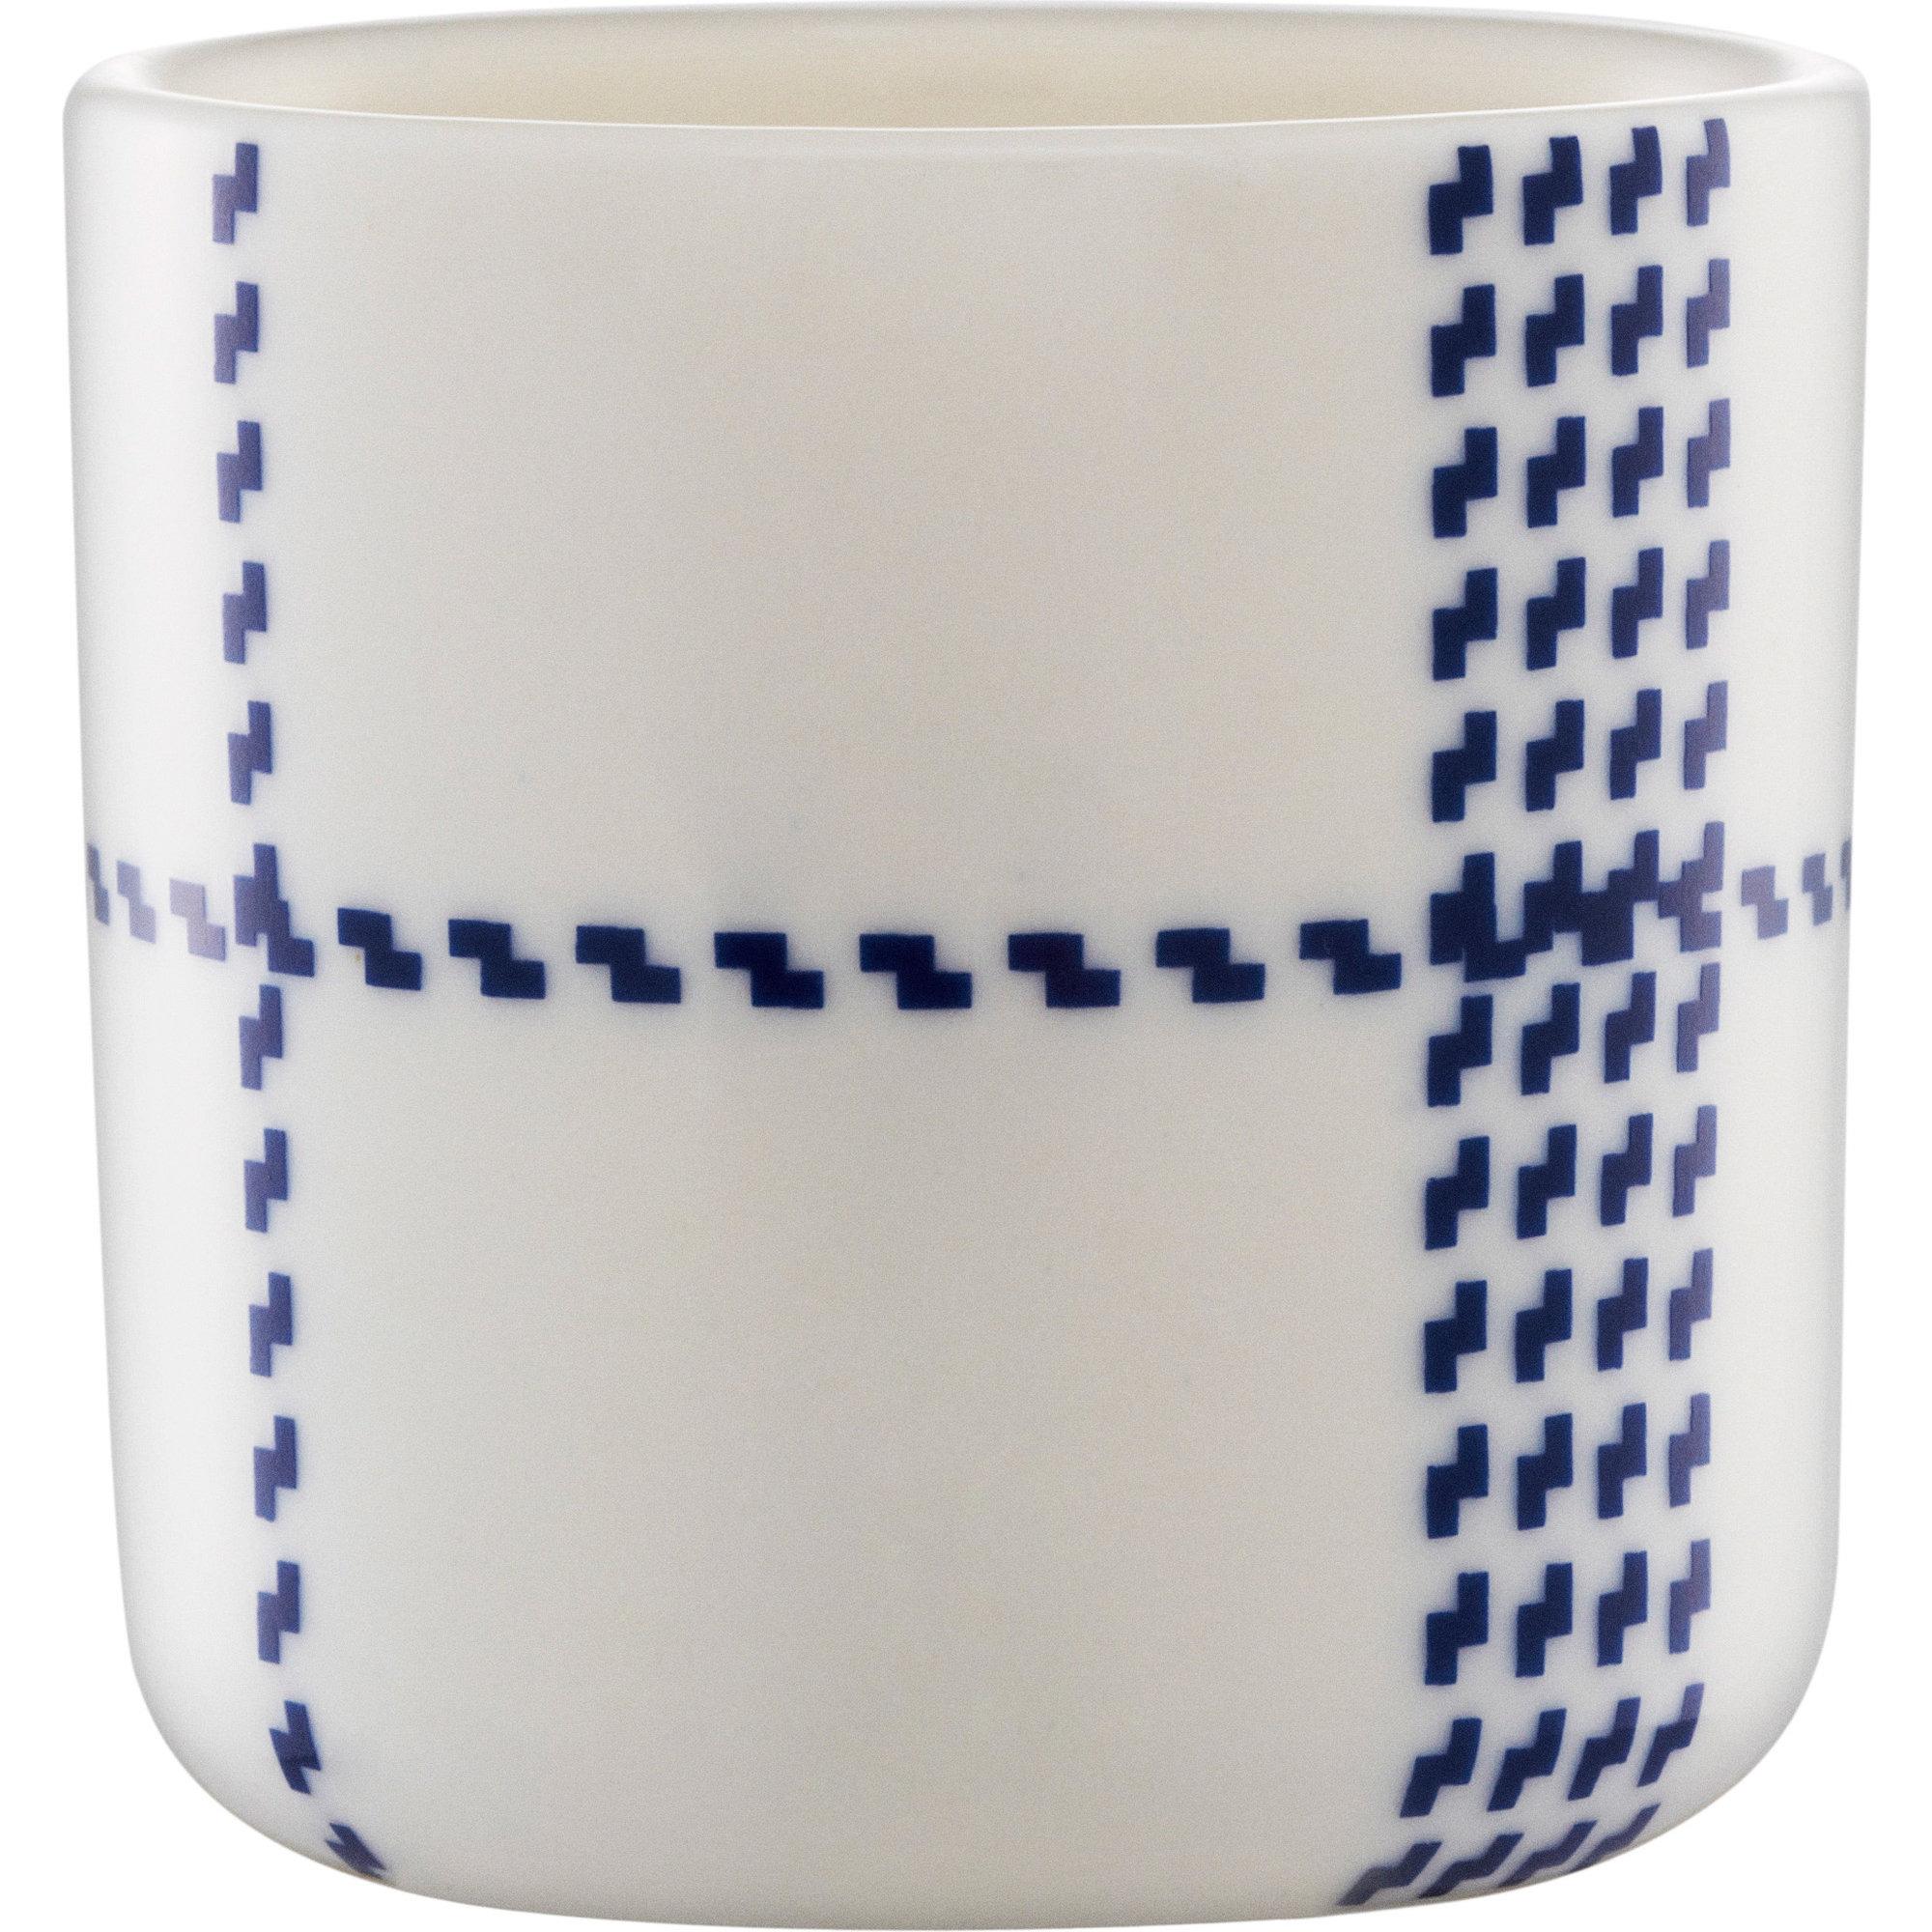 Normann Copenhagen Mormor Blue Eggcups – 2 pcs Whi